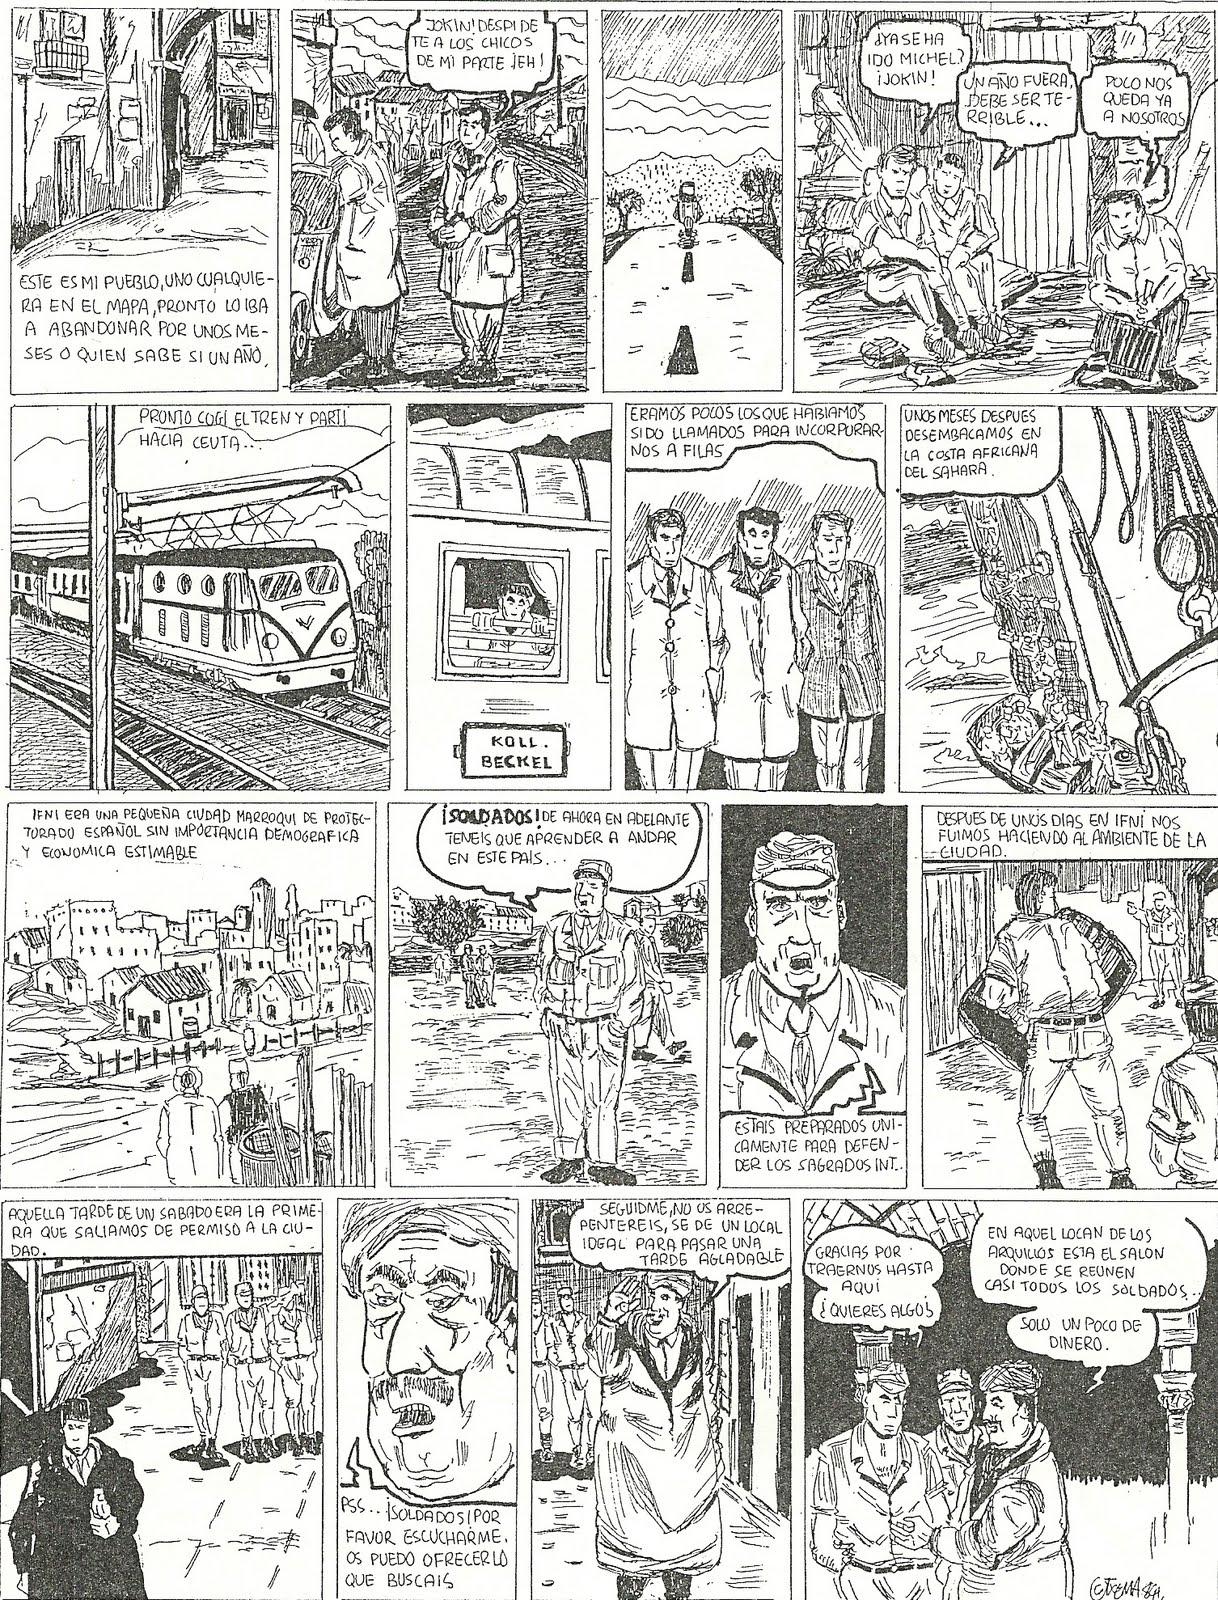 Aparato Duen Neska Porno Comic el rincon del quejica / kexontziarena: octubre 2011